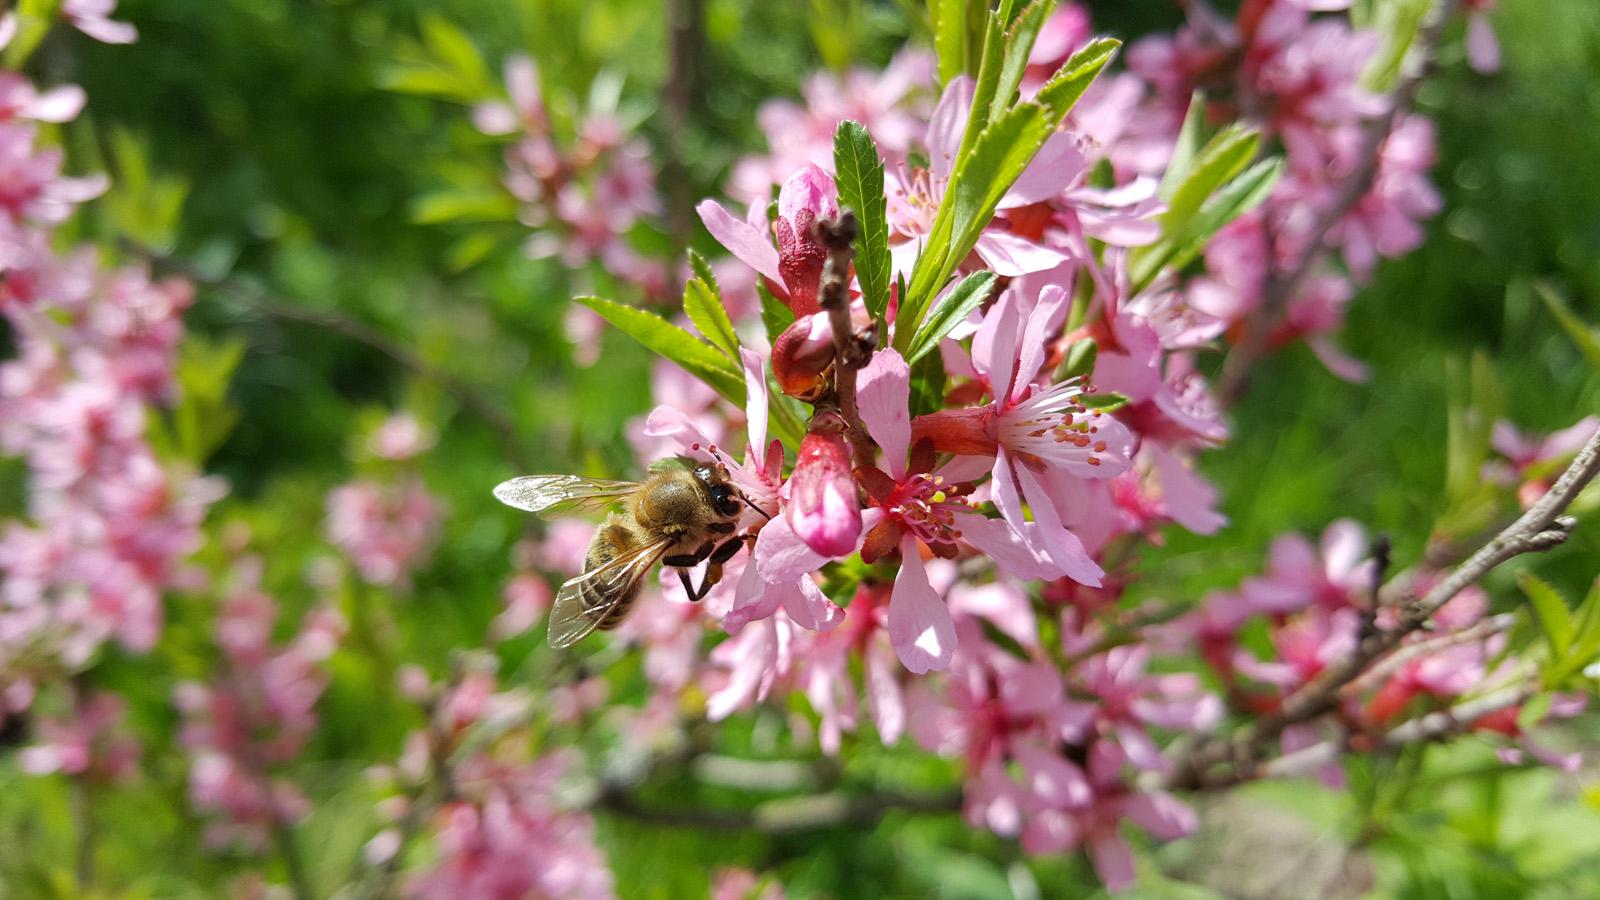 Пчелка на цветущем миндале. Снято на Samsung Galaxy S6 Edge